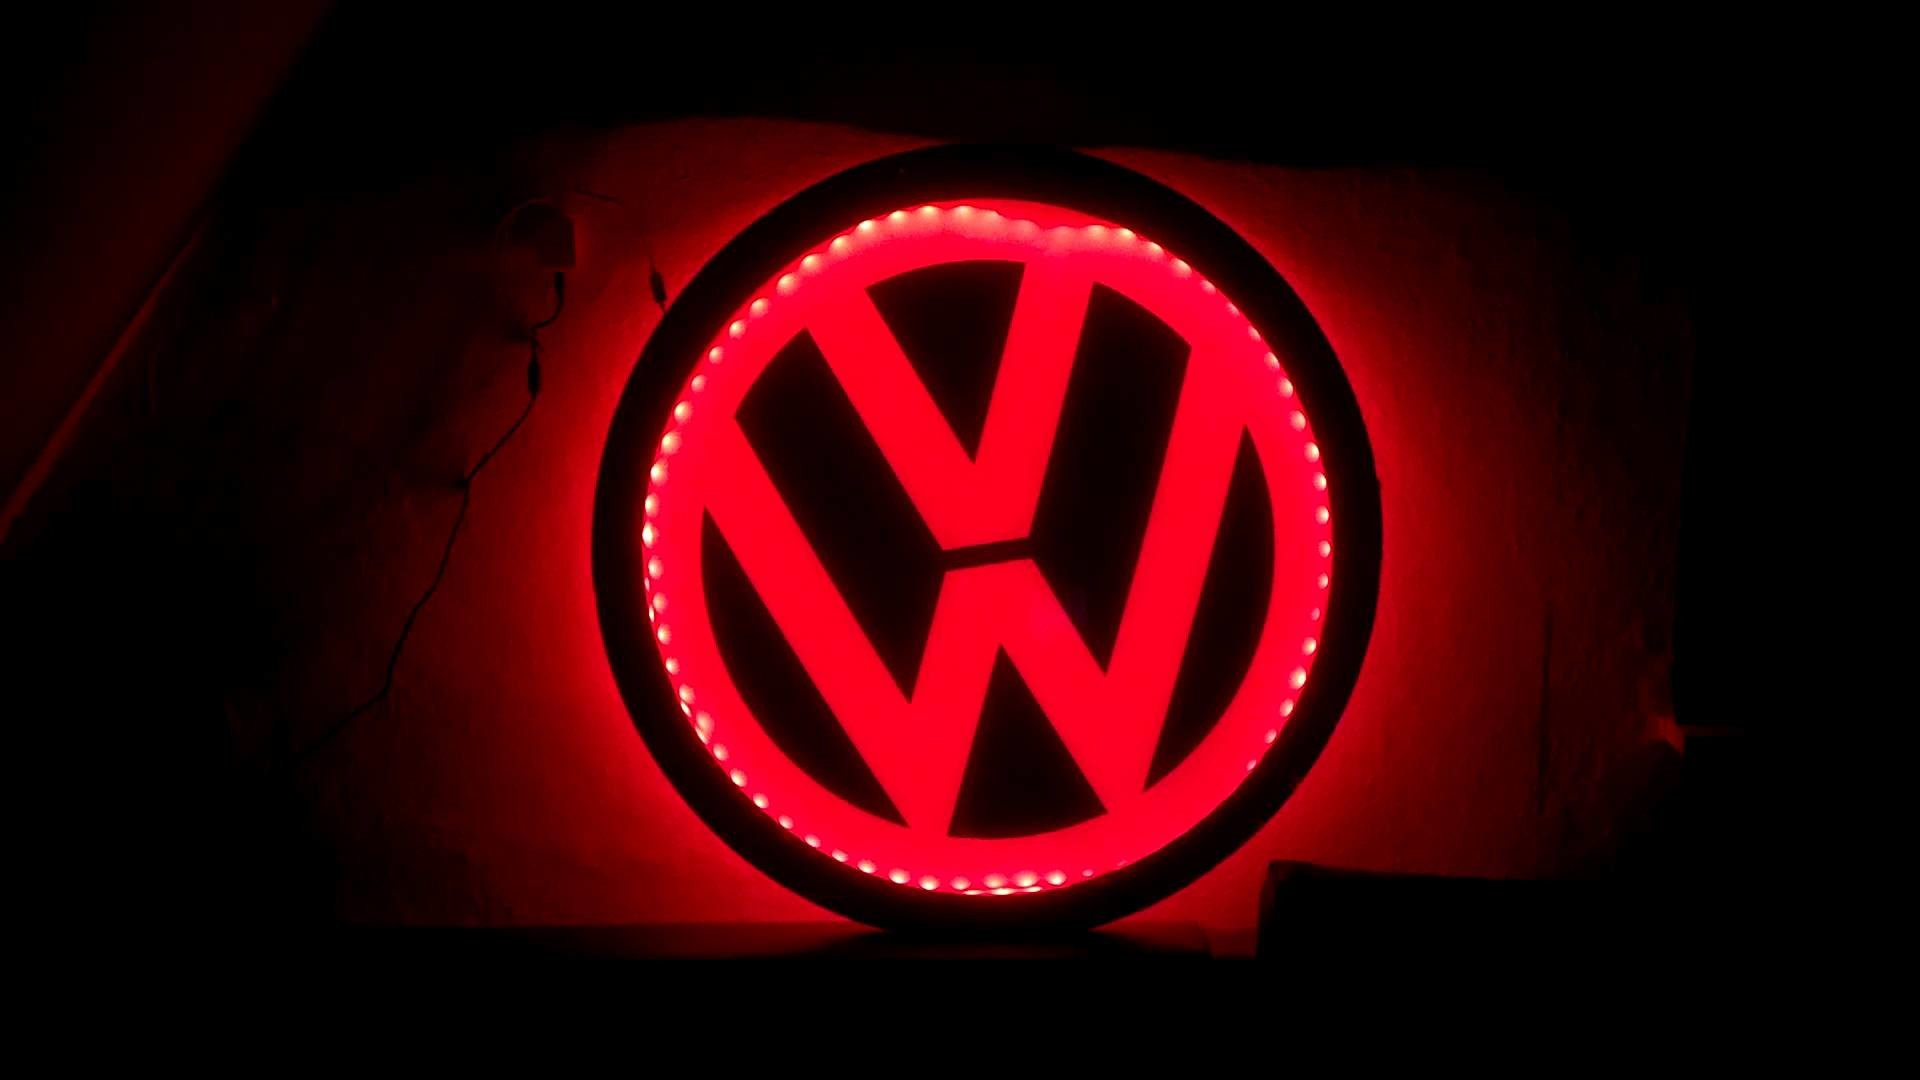 Best 3d Hd Wallpapers For Mobile Volkswagen Logo Wallpaper 58 Images